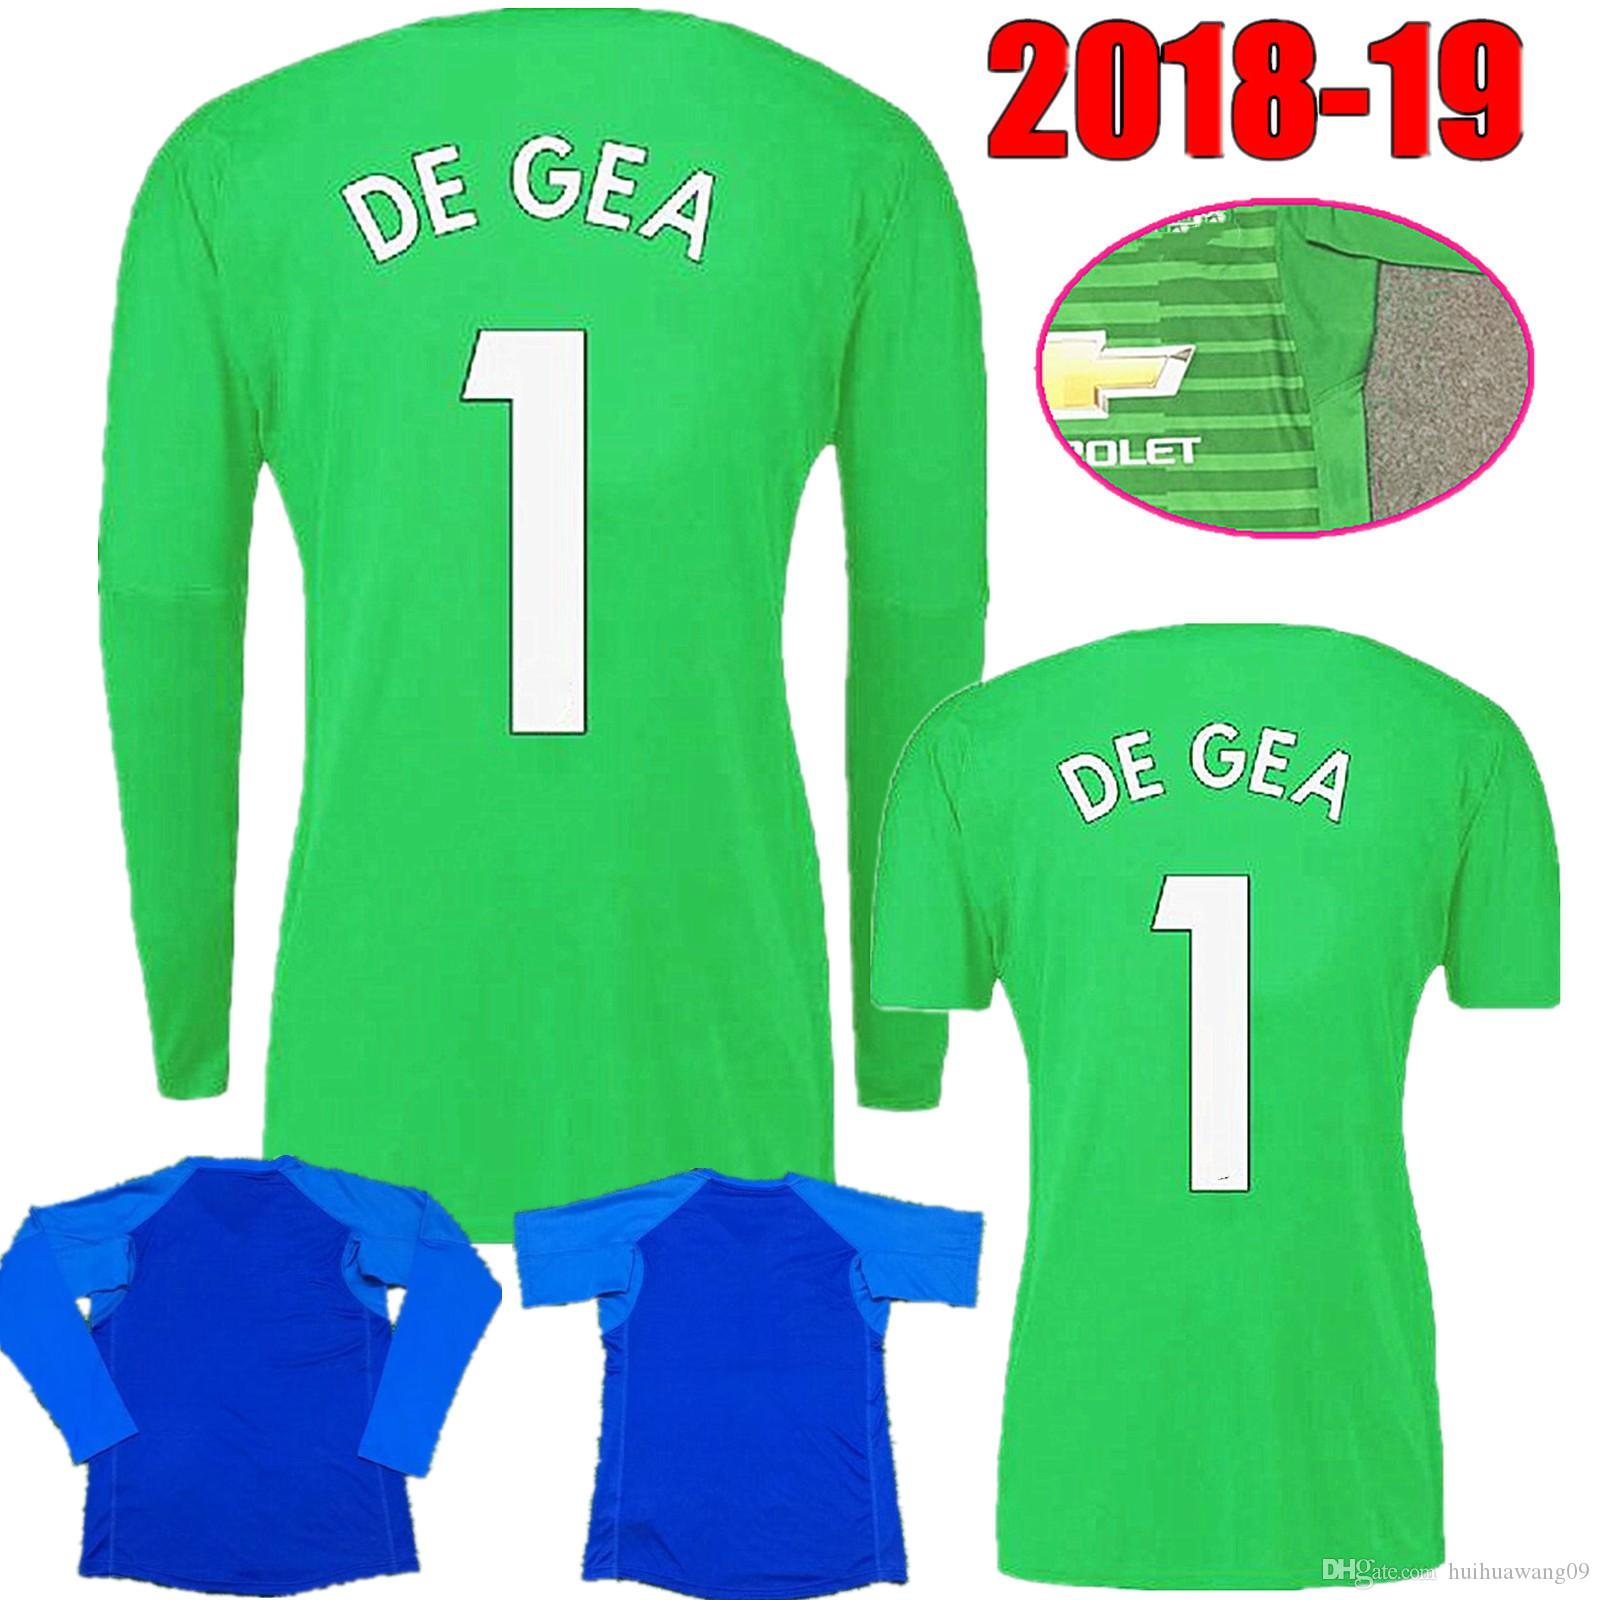 8dbfed4ee 2019 2018 2019 Men Adults Long Sleeve #1 De Gea Goalkeeper Jerseys Blue  Green Soccer Jerseys Short Sleeve Romero United Football Shirts From  Huihuawang09, ...